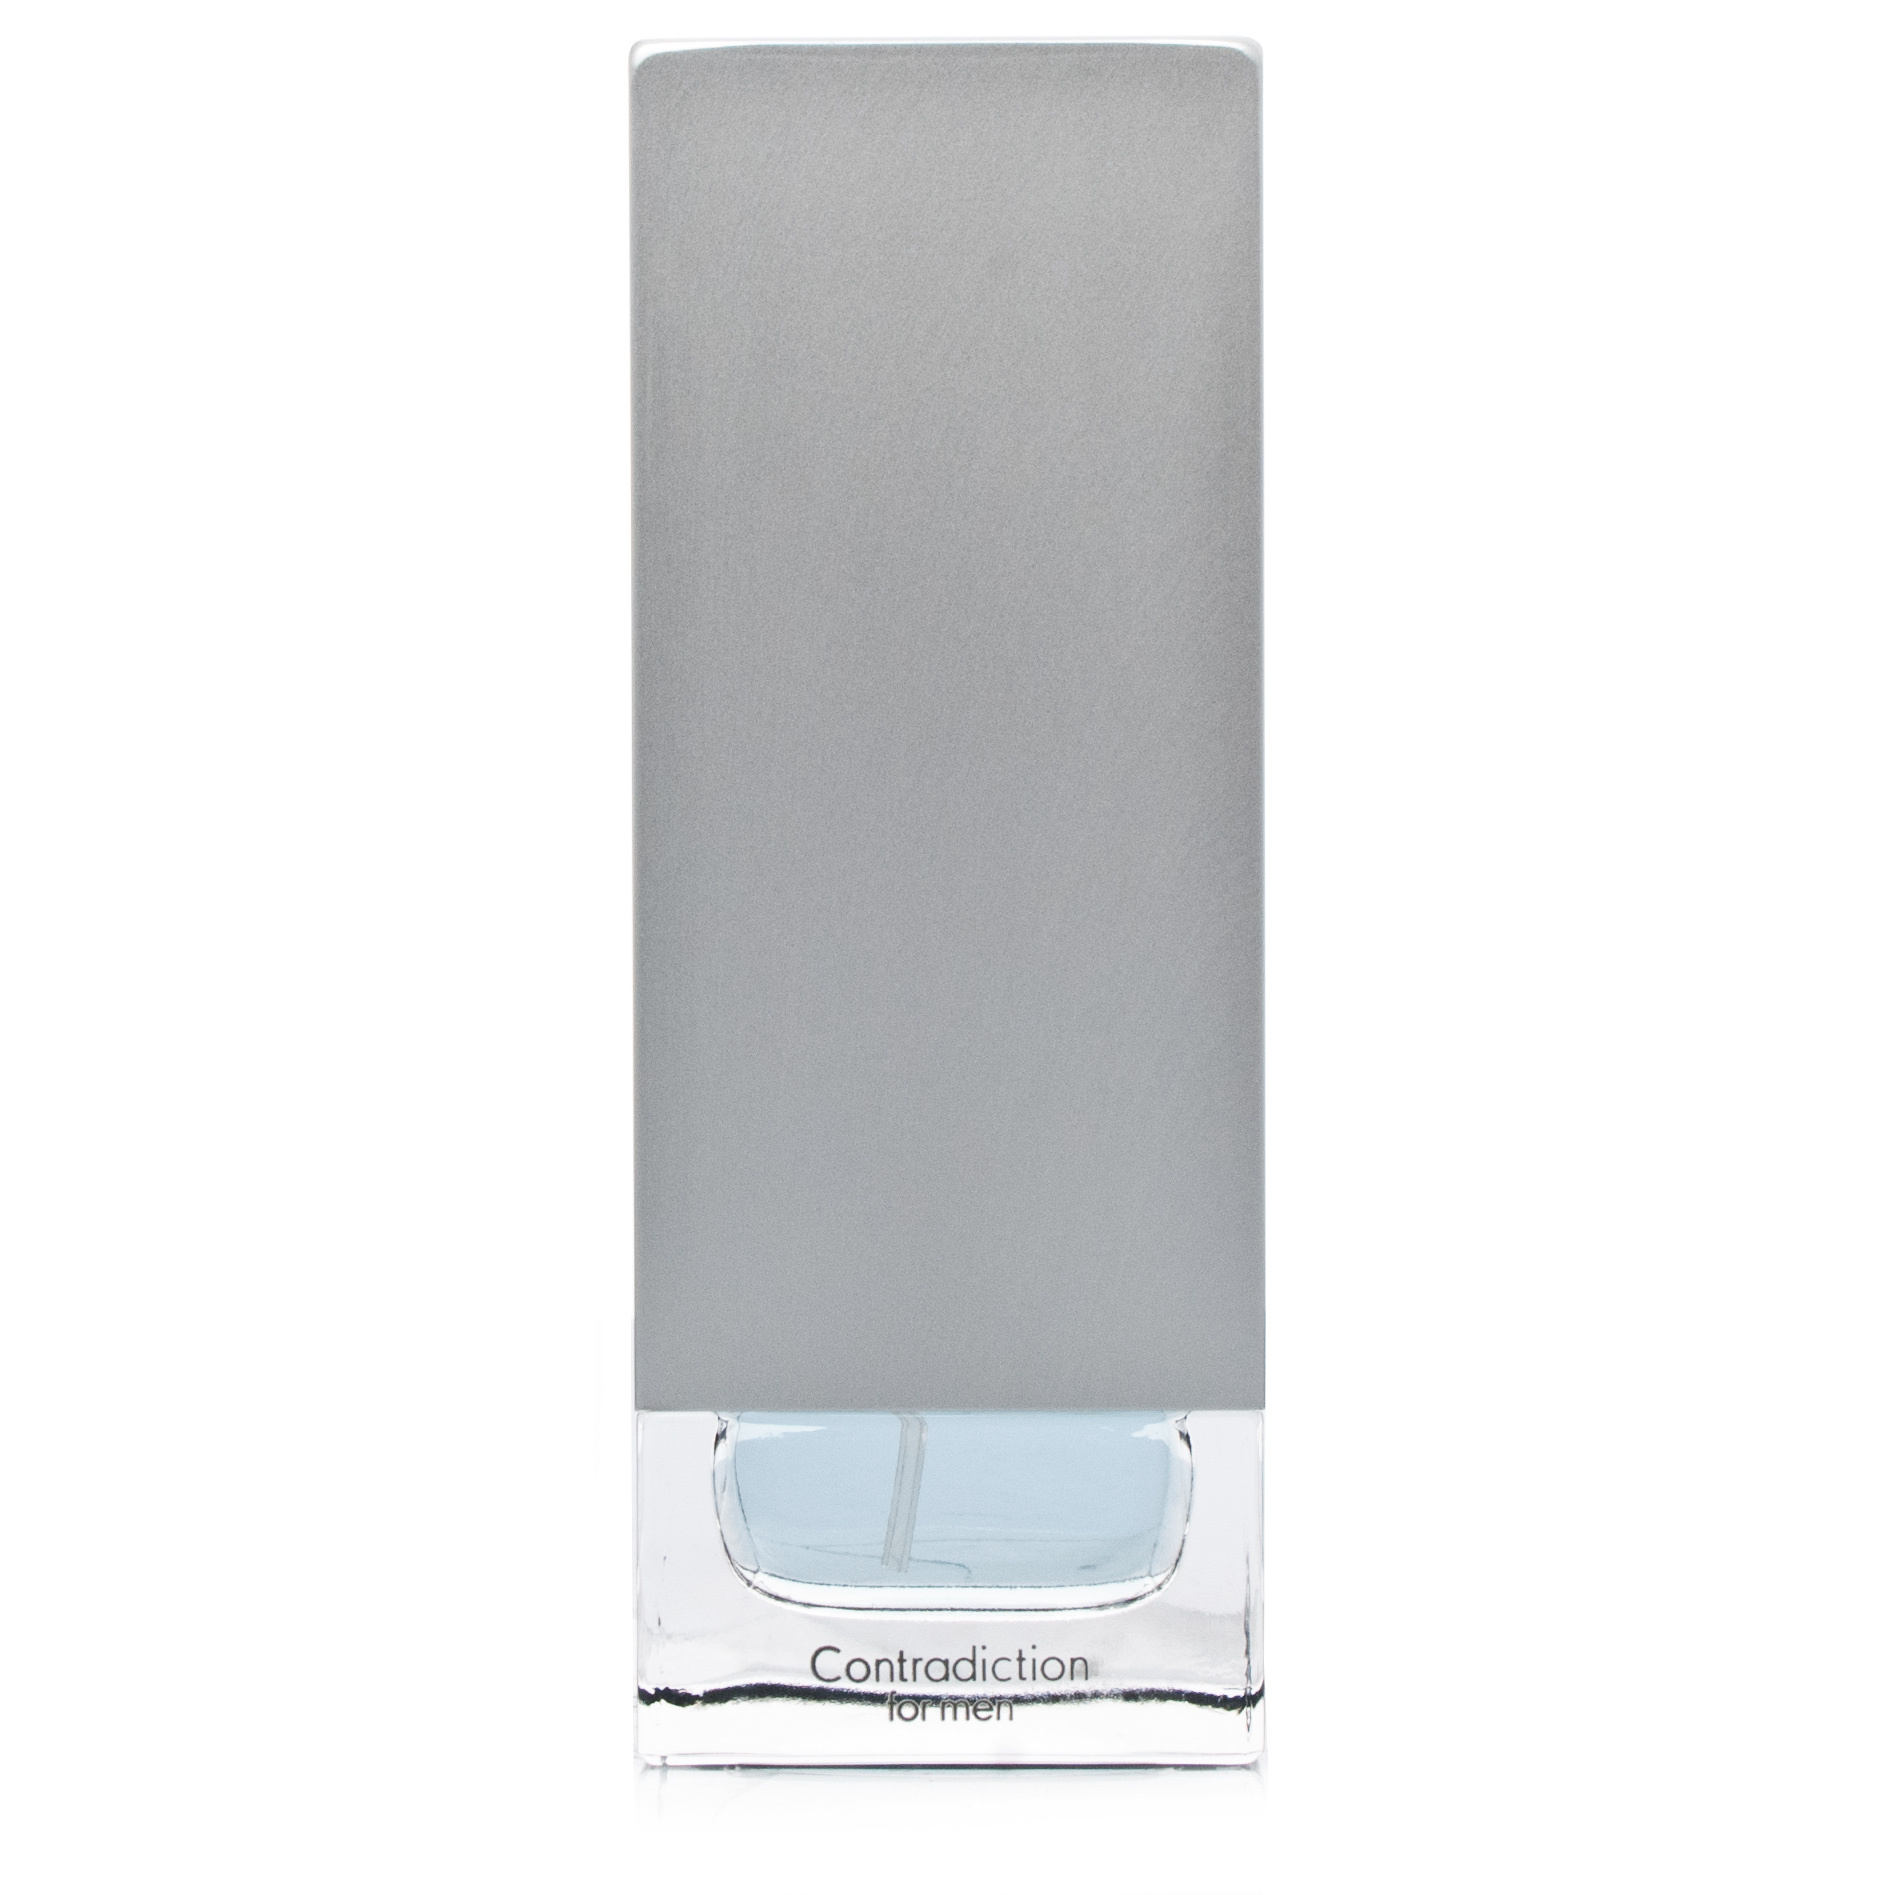 Productafbeelding van Calvin Klein Contradiction For Men Eau De Toilette 50ml